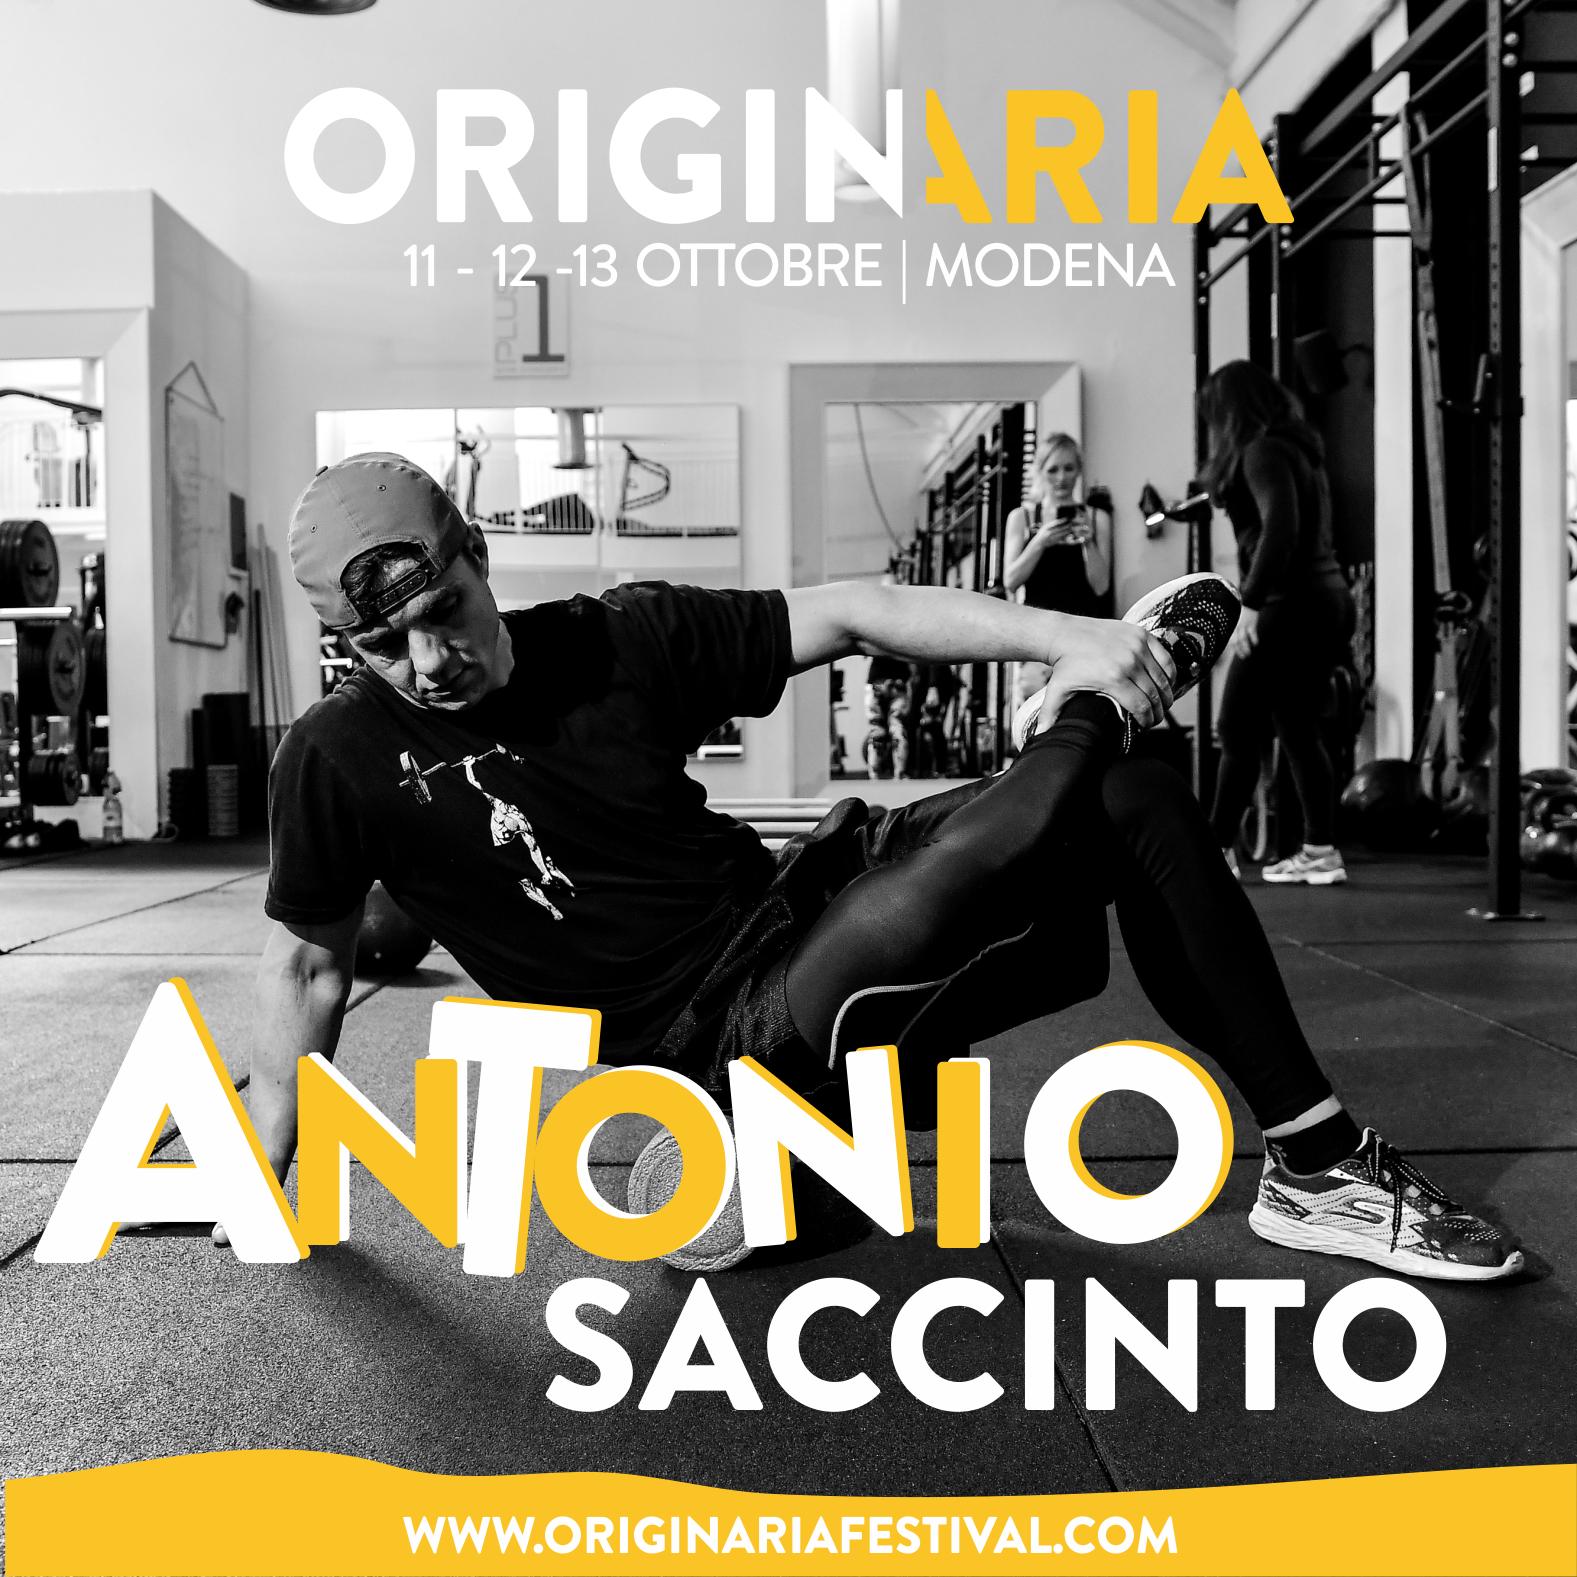 Antonio Saccinto OriginAria Festival